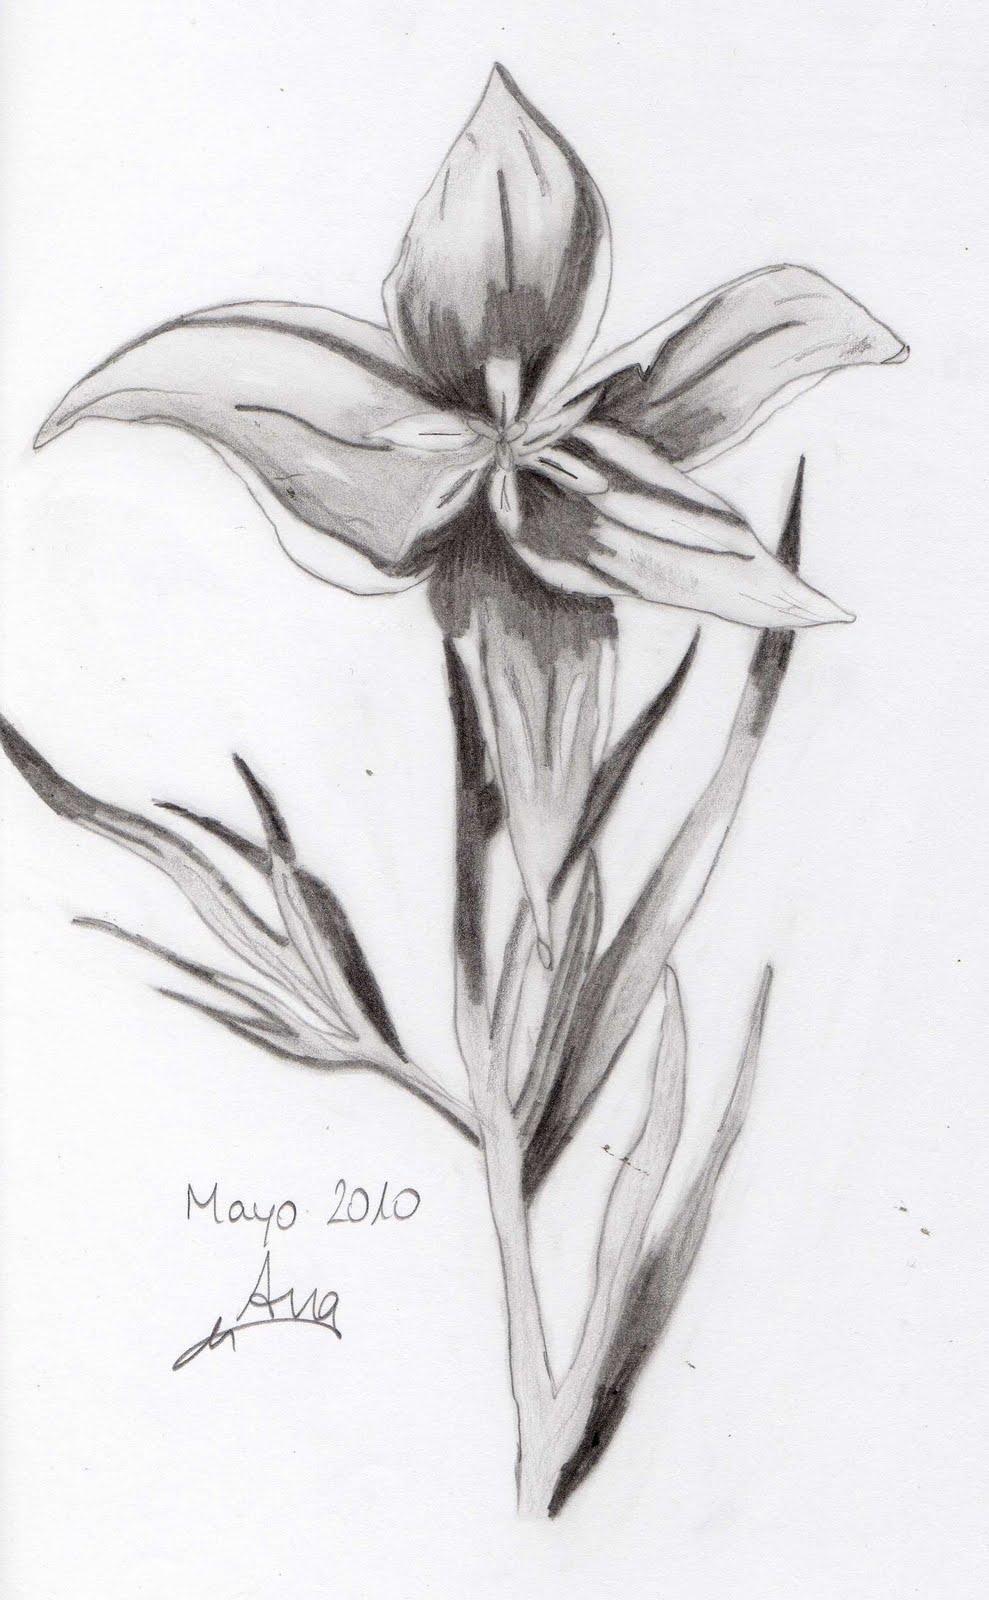 Imagenes De Flores Chidas Para Dibujar Imagui